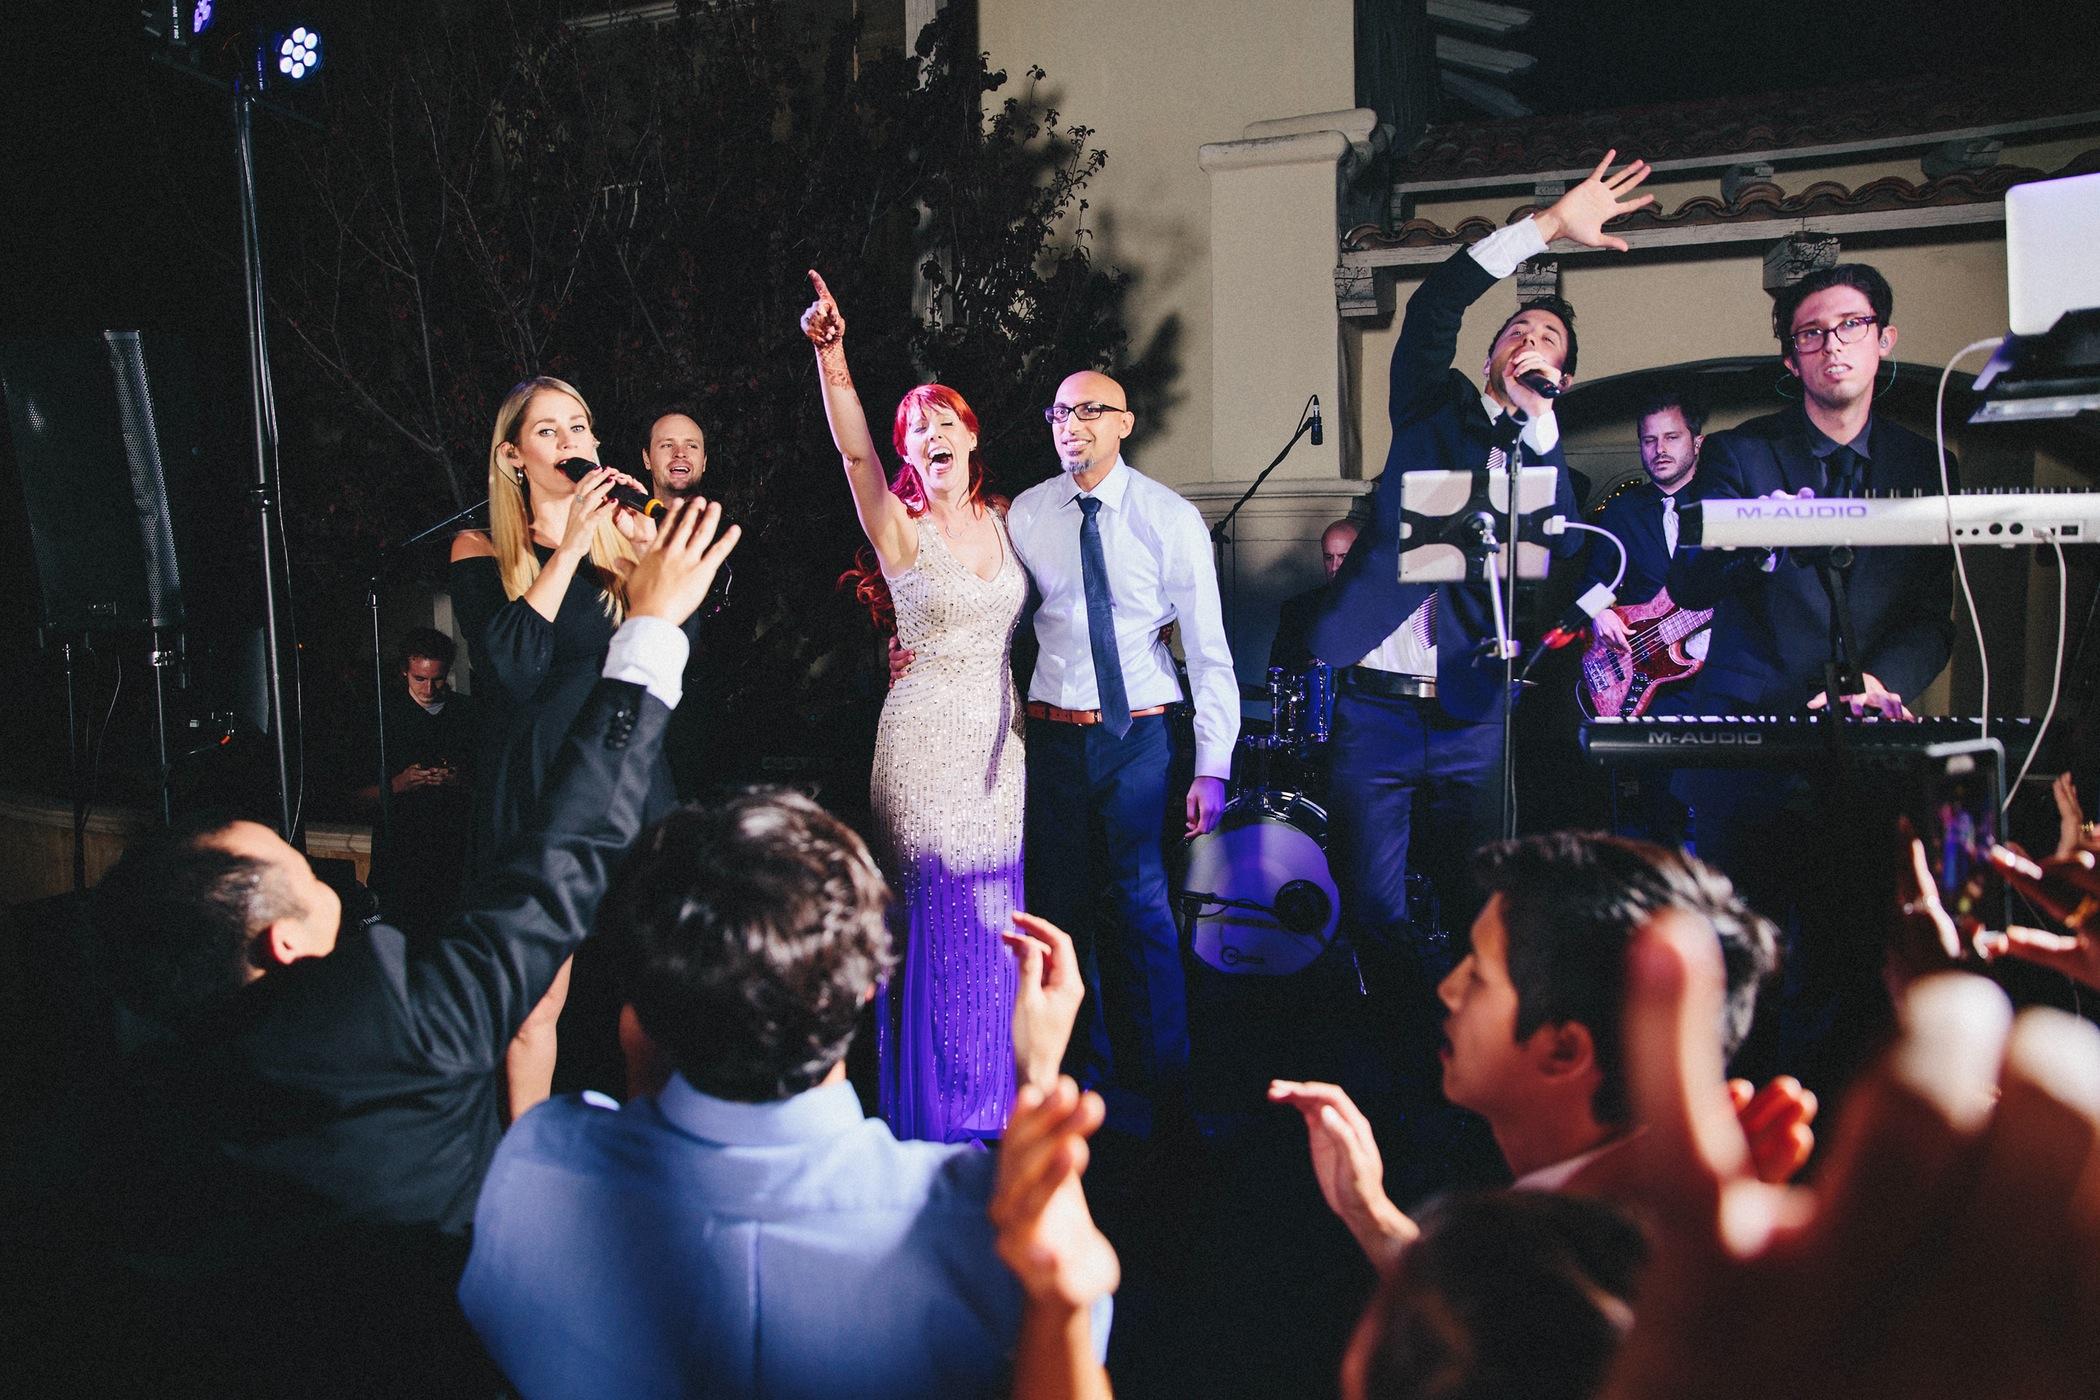 Destination Wedding Entertainment Undercover Live